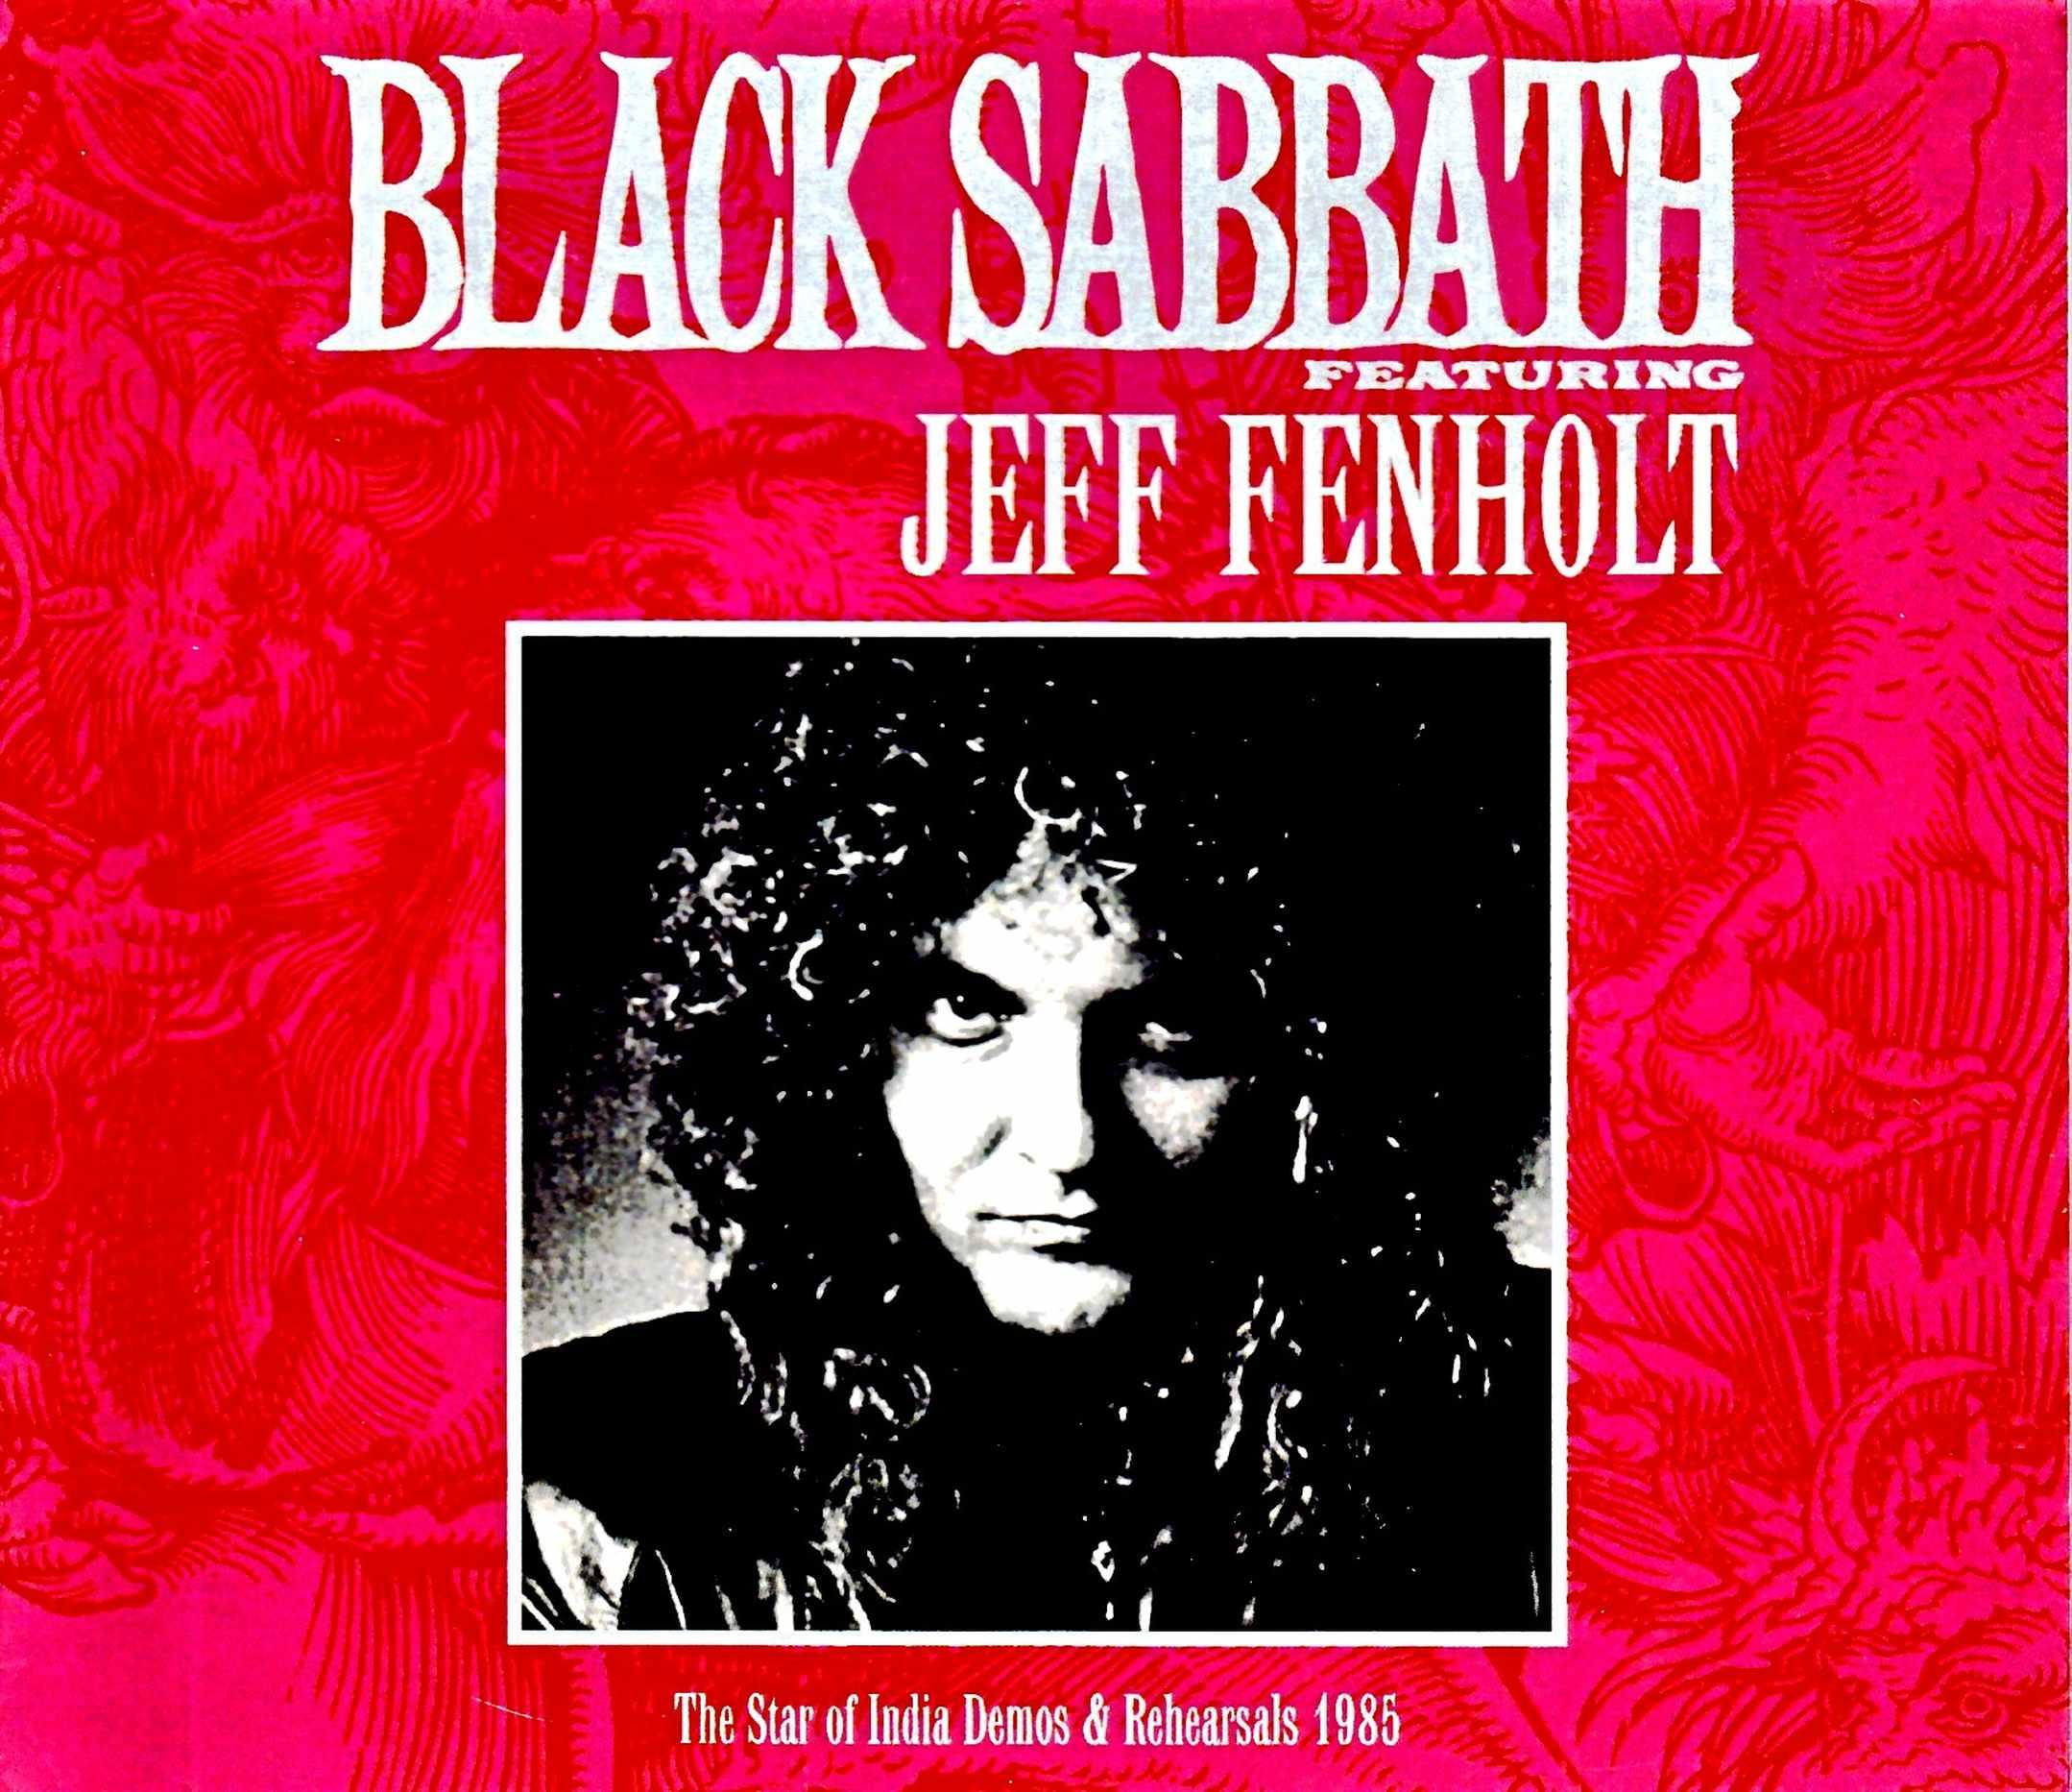 Black Sabbath,Jeff Fenholt ブラック・サバス/The Star of India Demos & Rehearsals 1985 Version 1